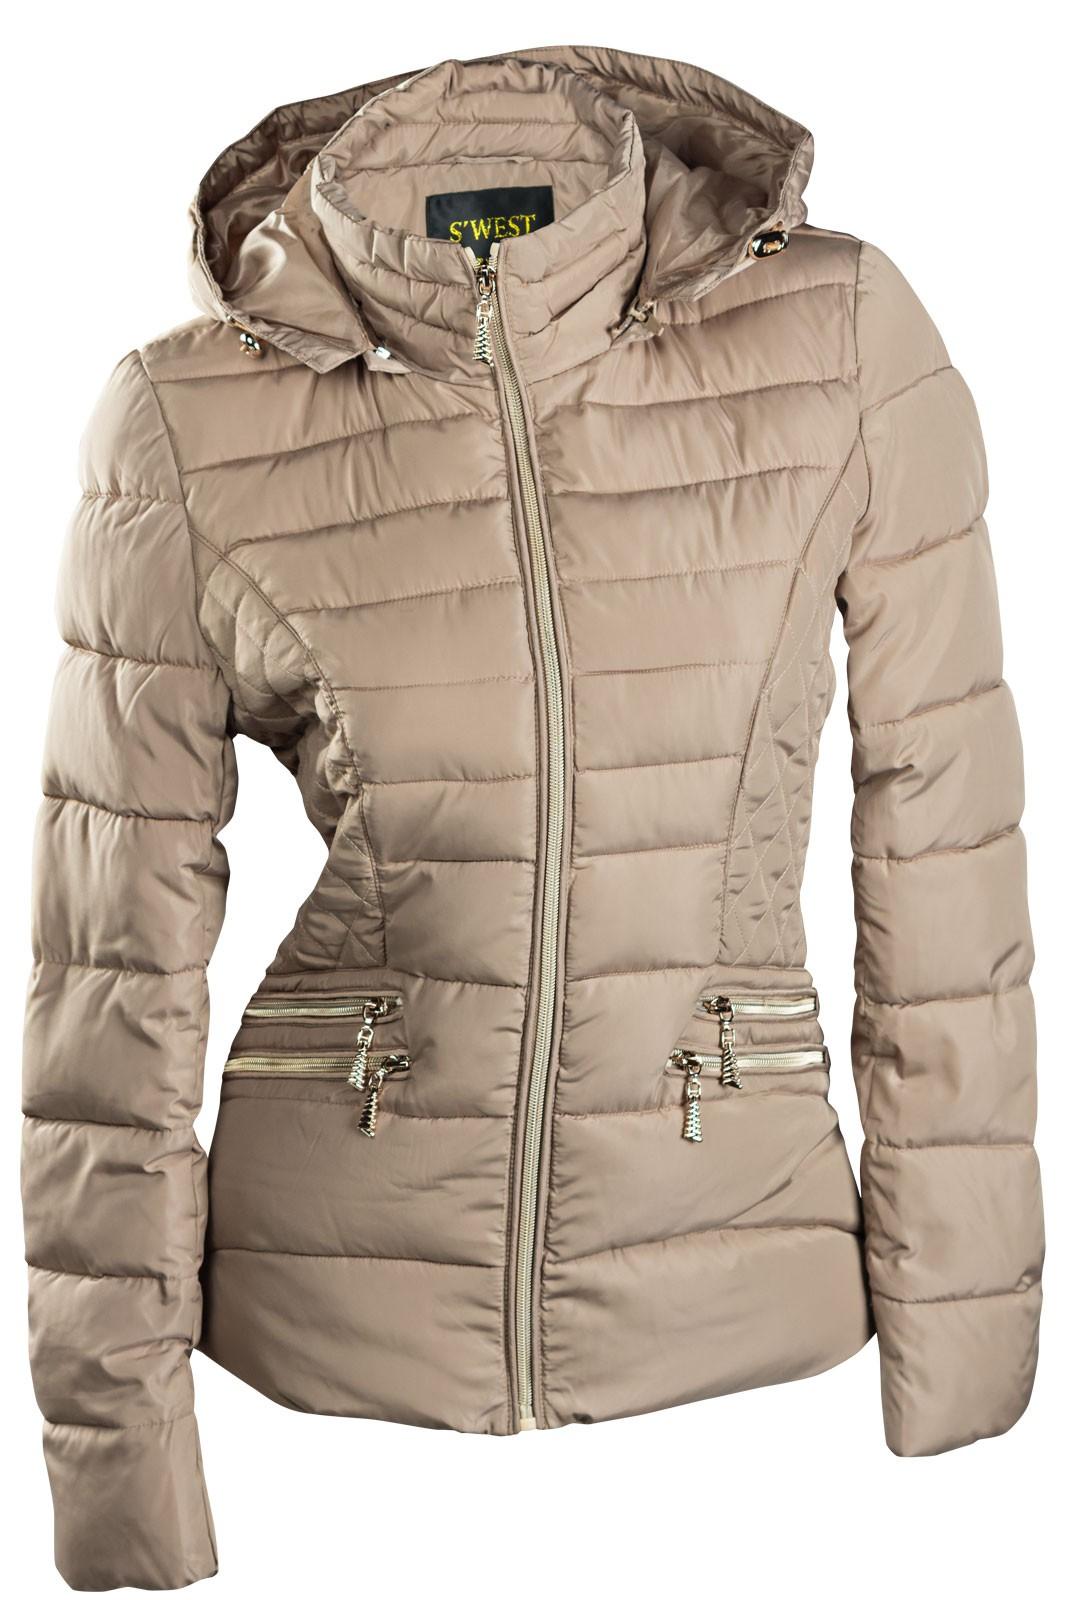 competitive price e9cb7 b6018 Damen Winterjacke Steppjacke Skijacke Übergangsjacke